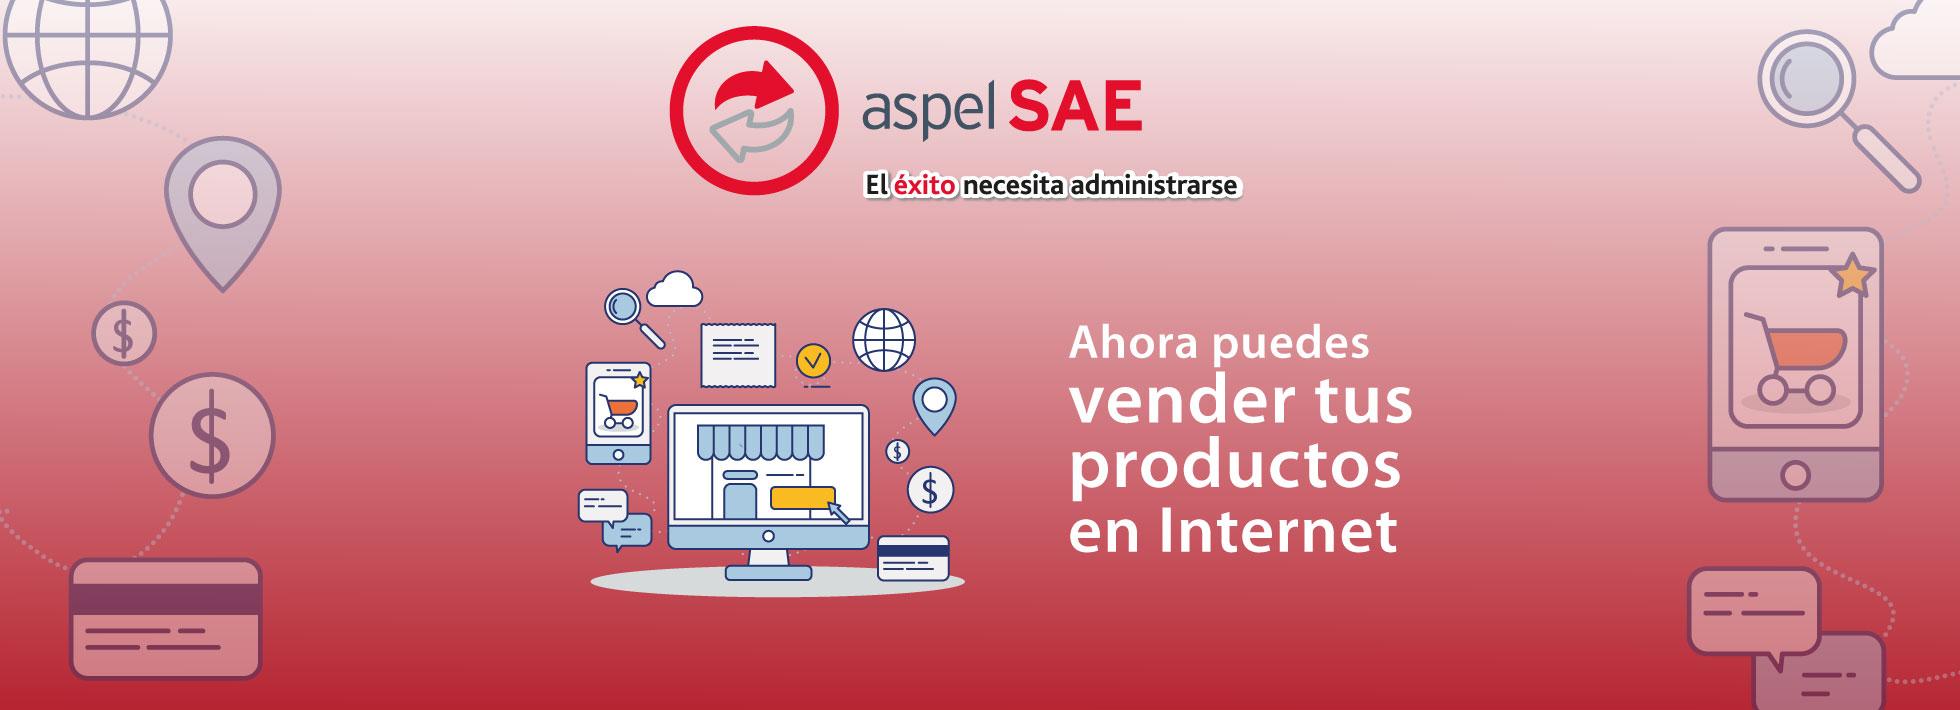 Aspel-SAE 8.0  te conecta